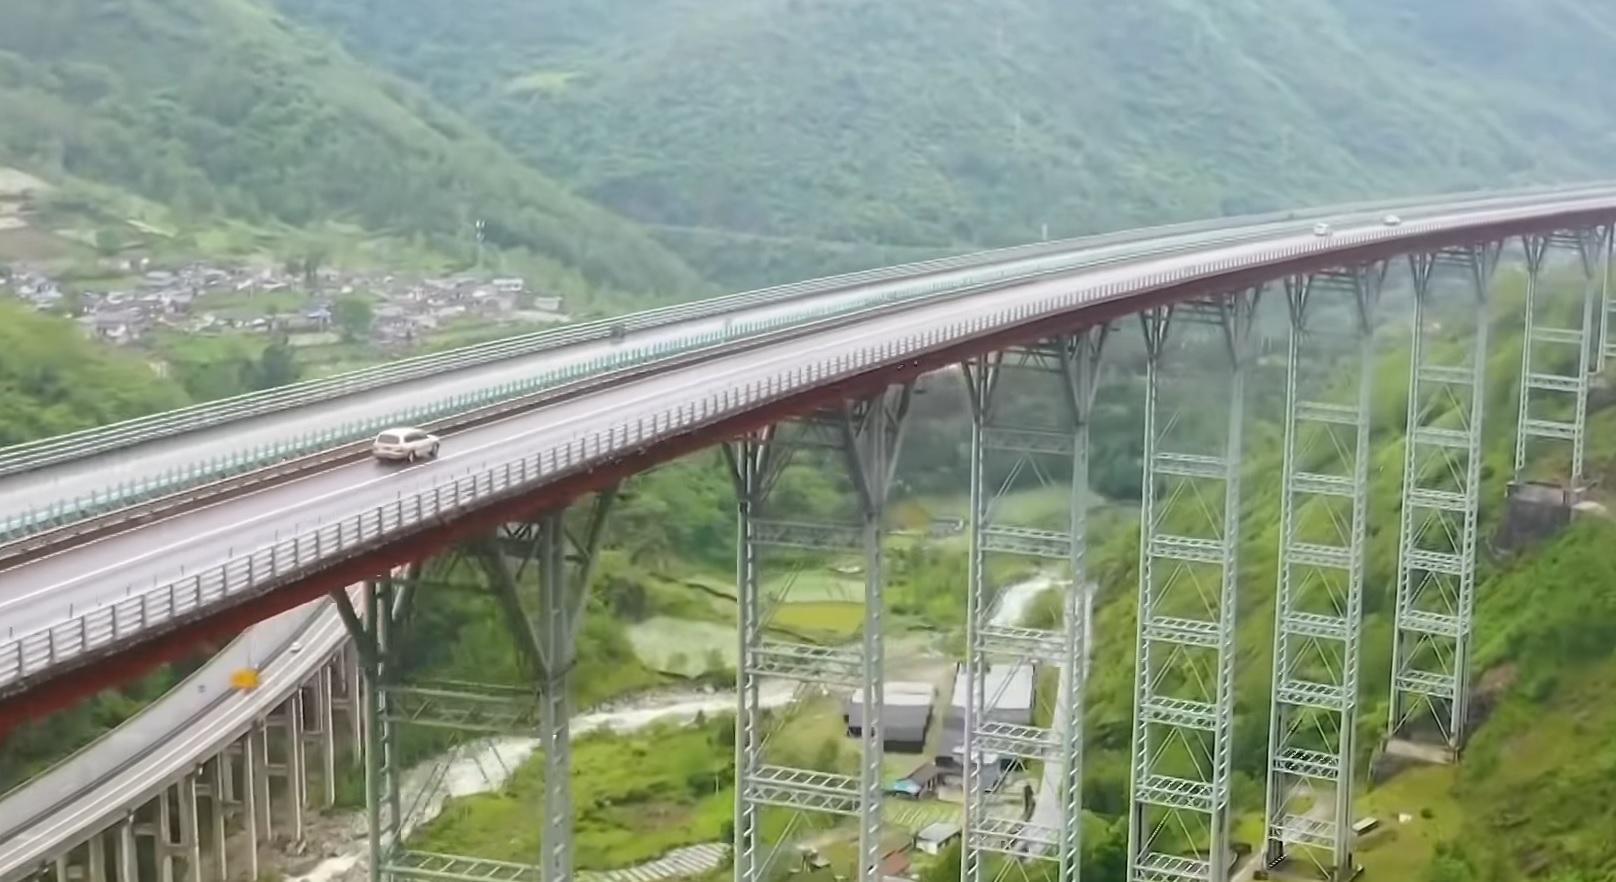 Autostrada Yashi